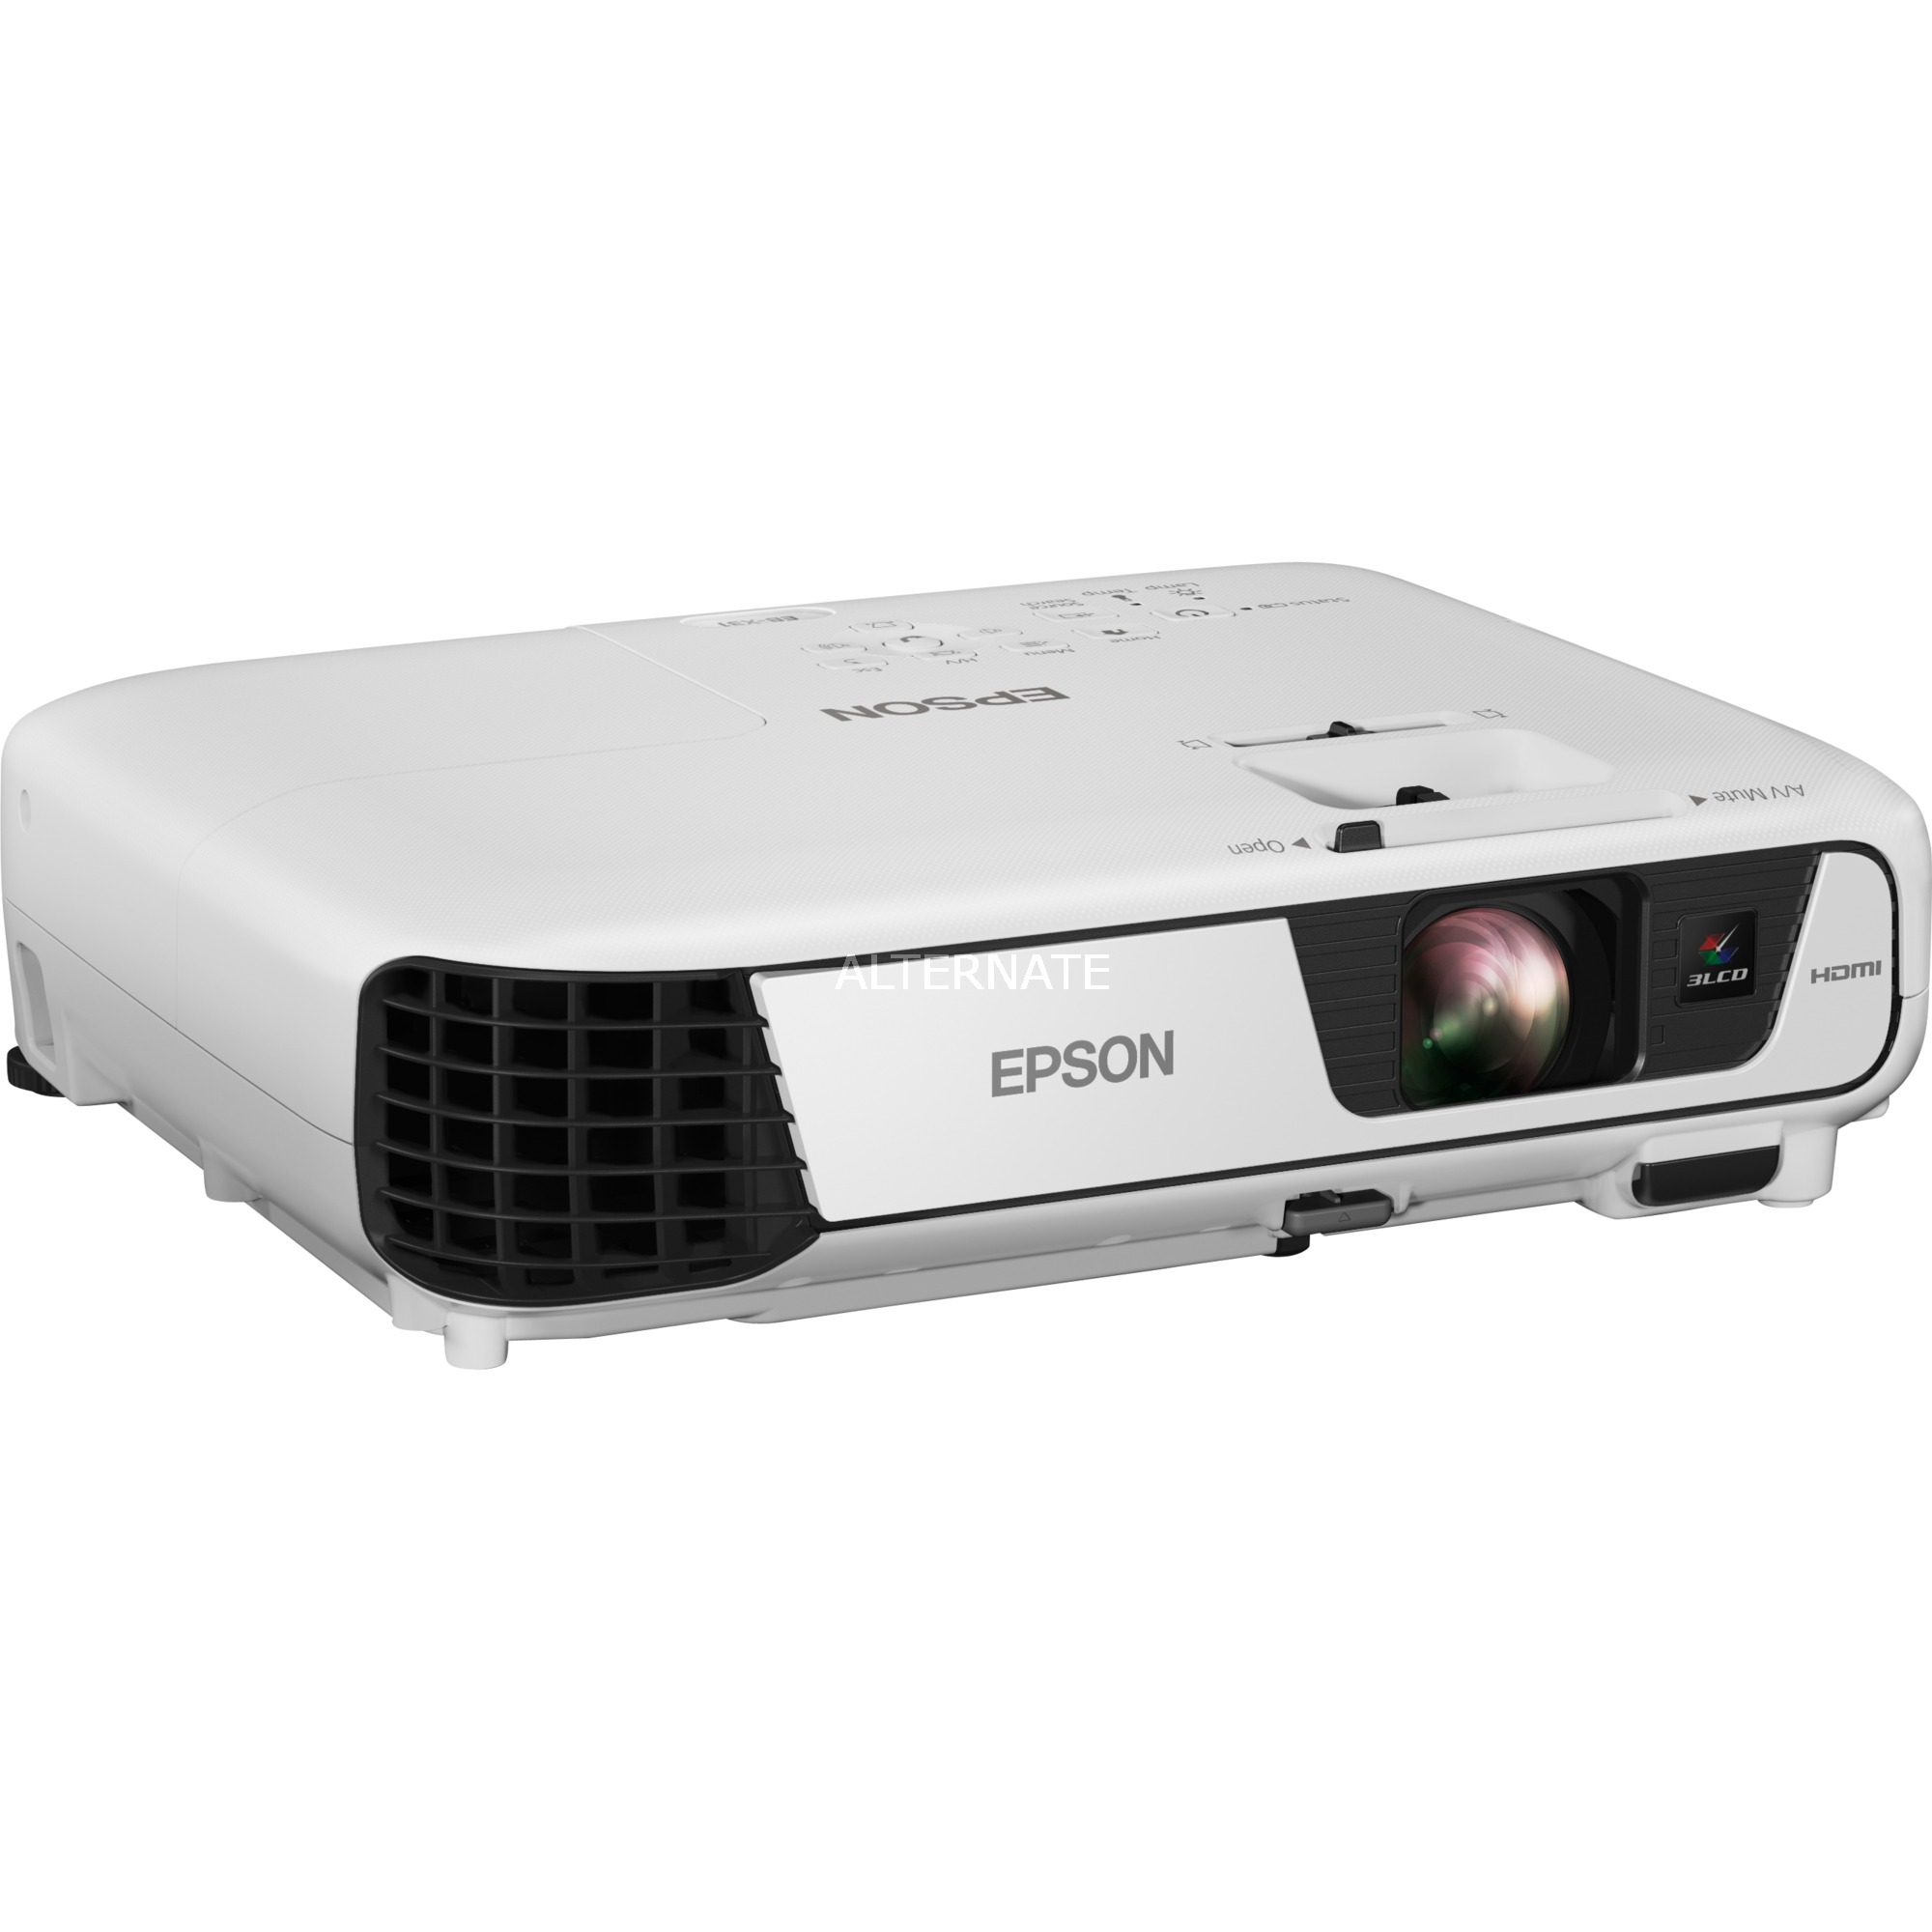 EB-X31 Projecteur de bureau 3300ANSI lumens 3LCD XGA (1024x768) Blanc vidéo-projecteur, Projecteur LCD